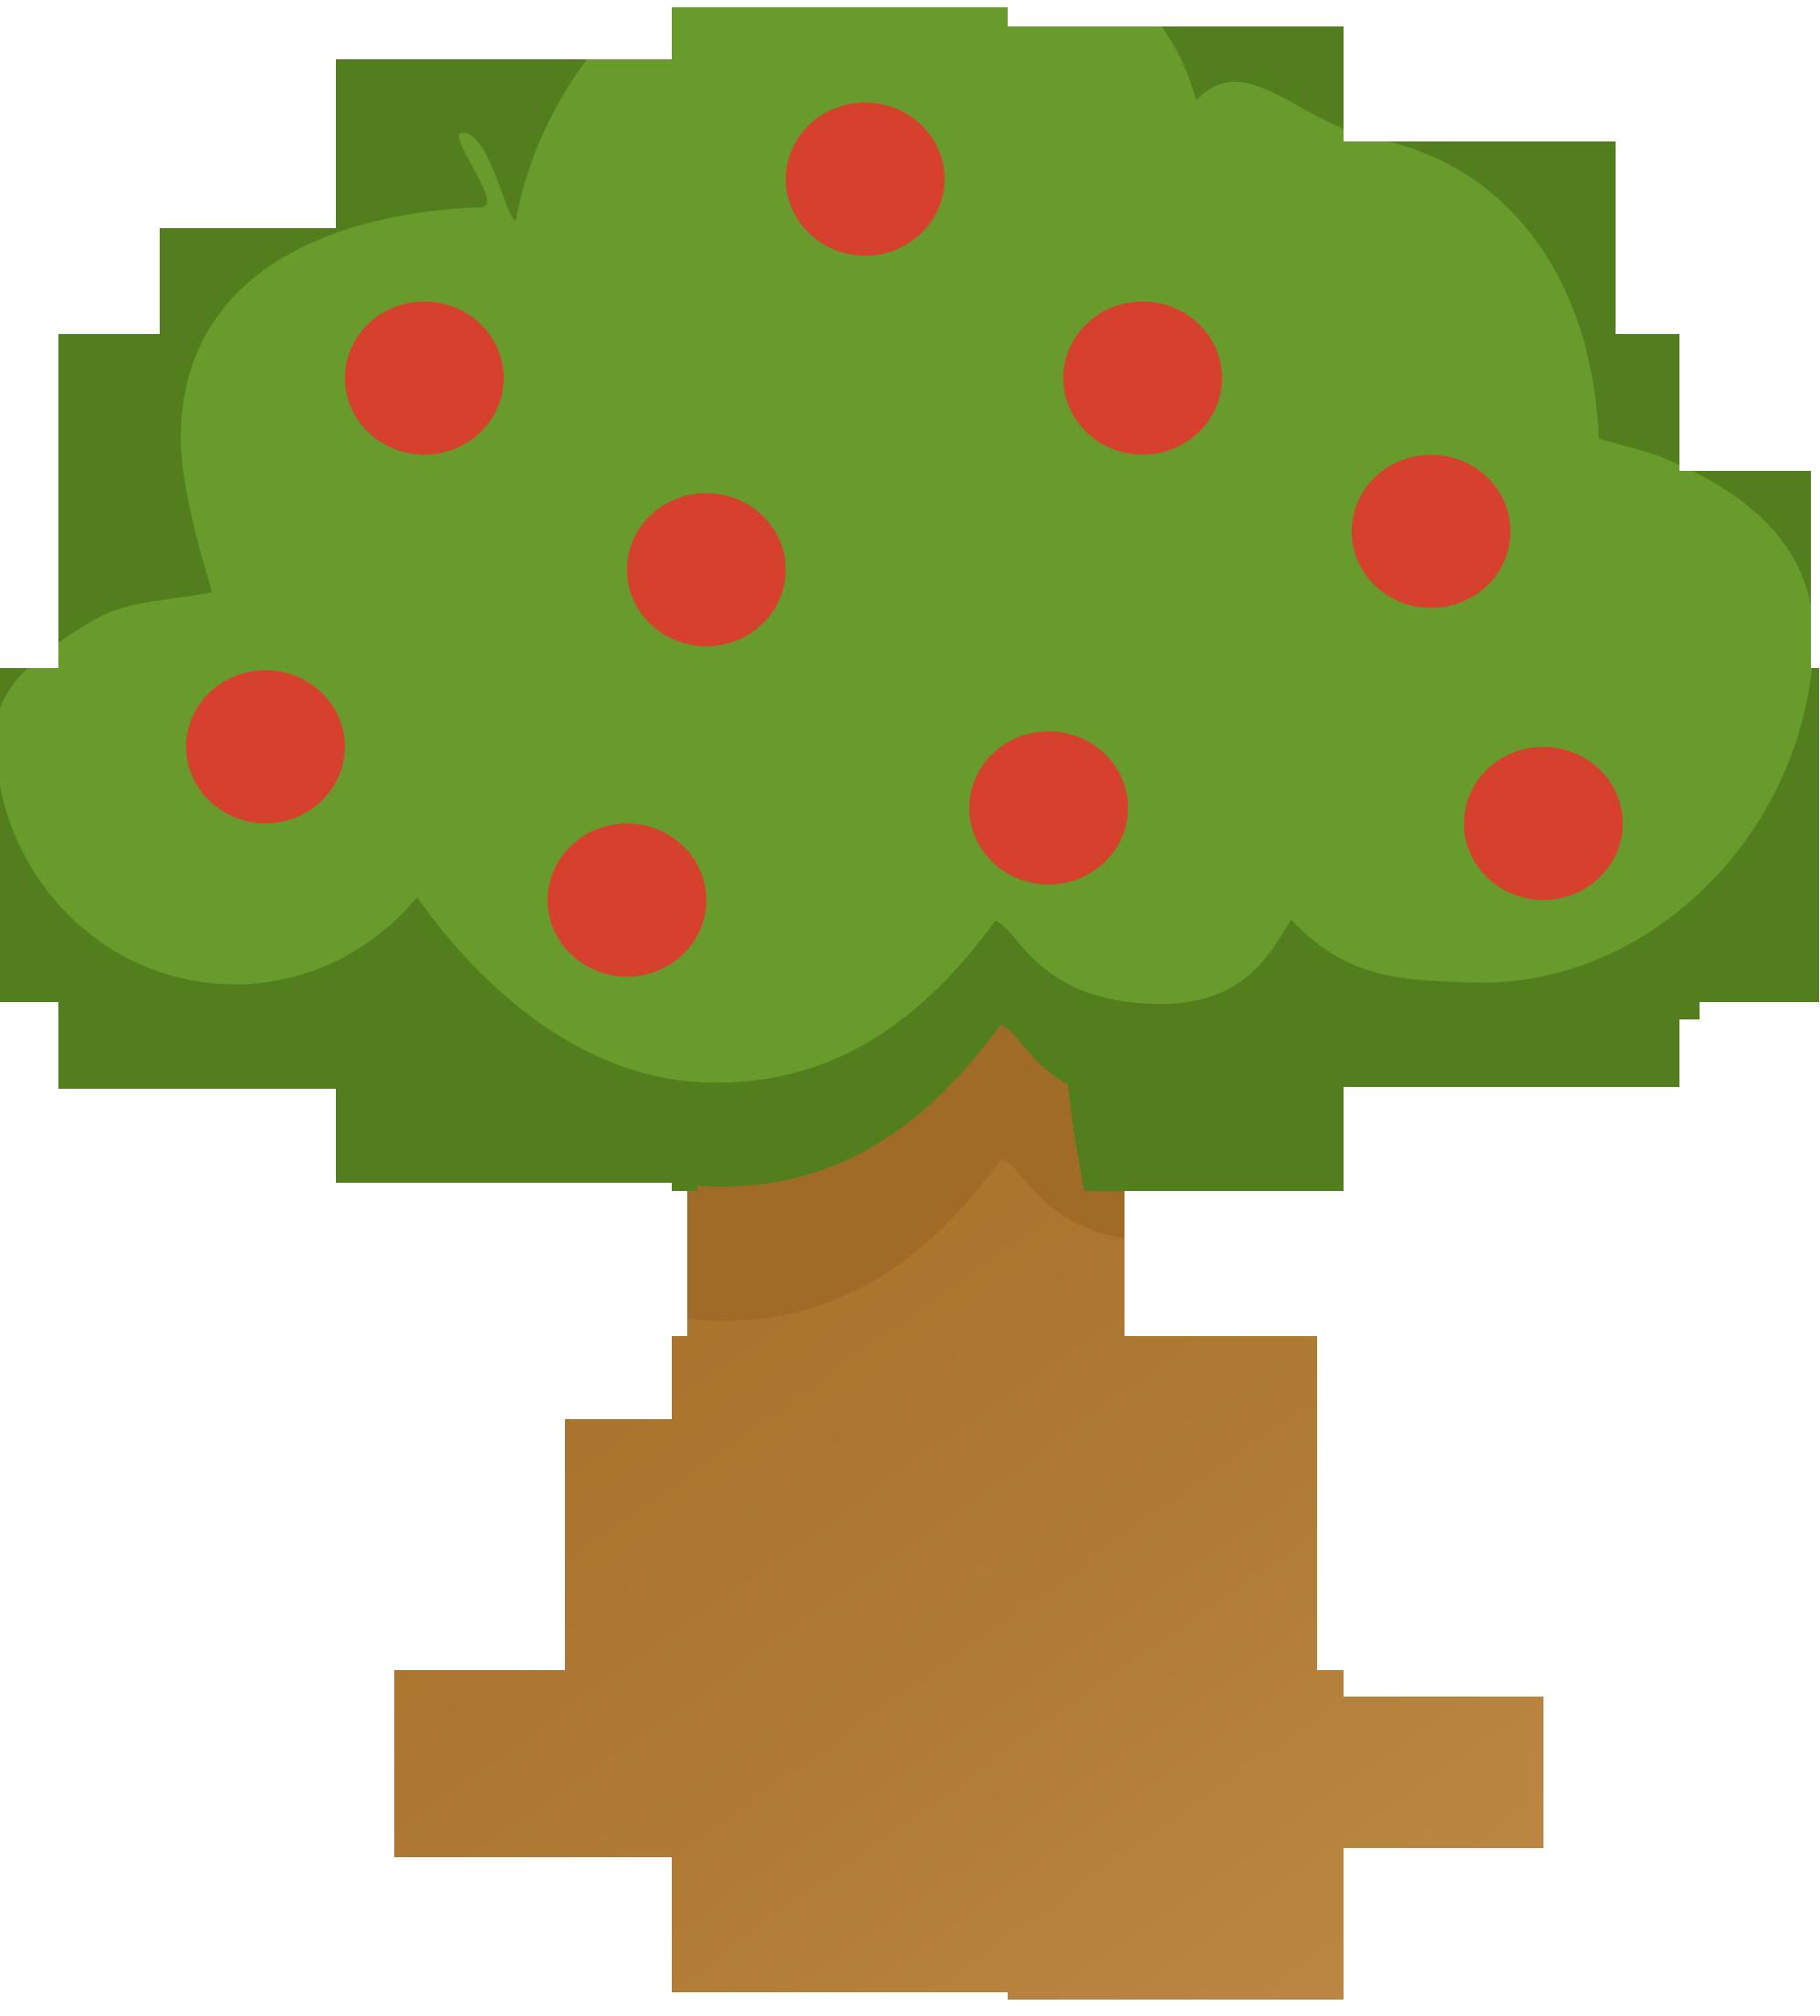 Apple Tree Clip Art Transparent Download Png Get Free High Quality Apple Tree Clip Art Transparent Download Png Clip Art Apple Clip Art Free Tree Clipart